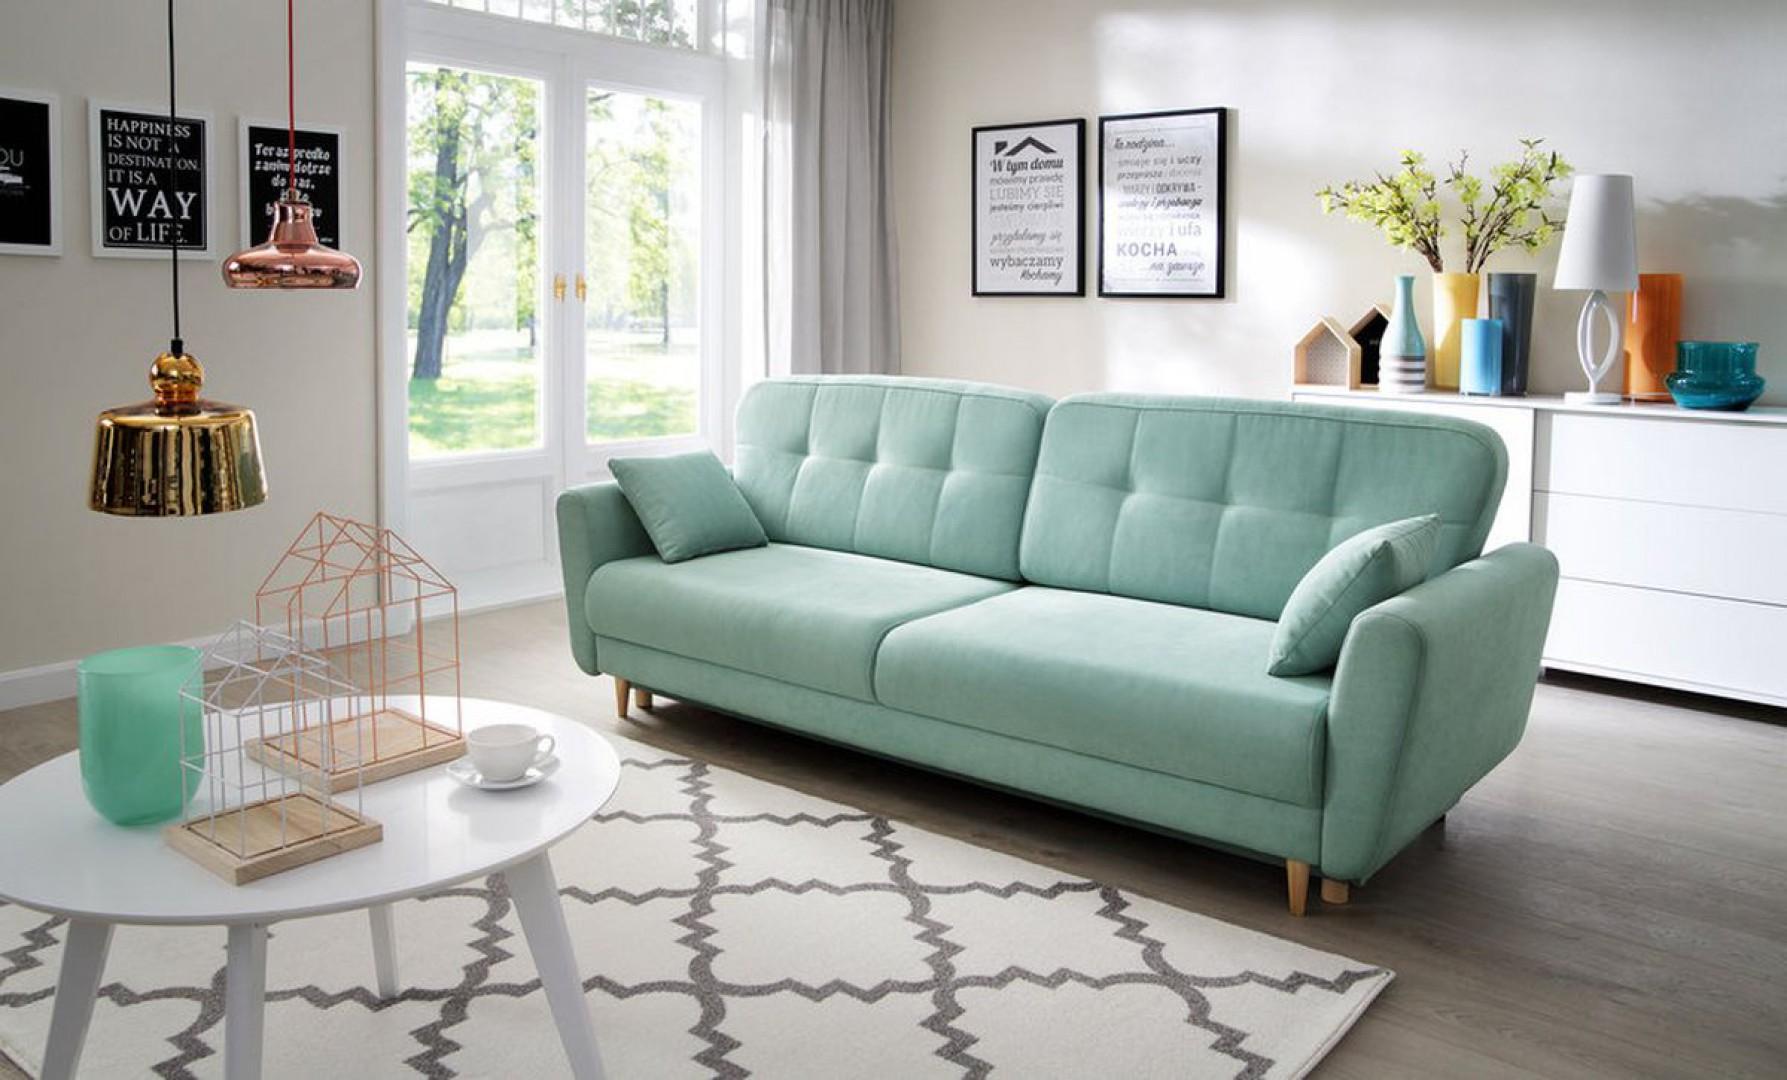 Sofa Dakota z oferty salonów Agata. Fot. Agata